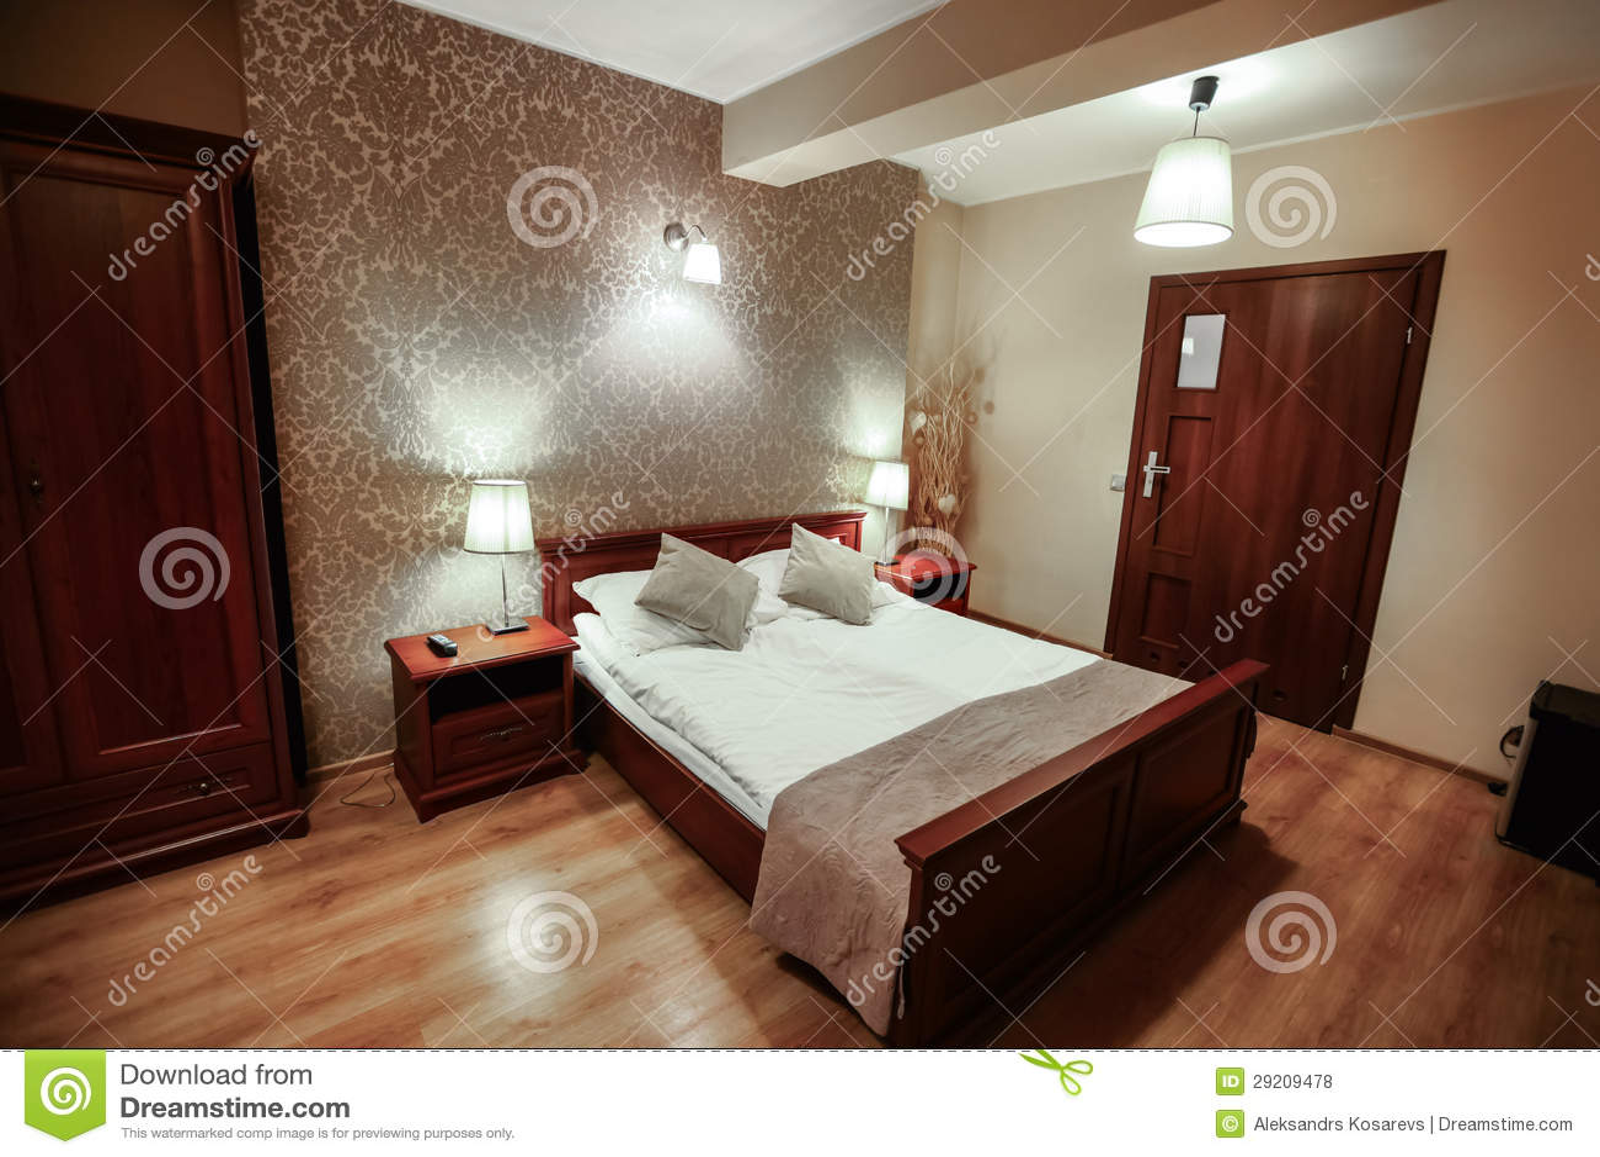 modern luxury hotel interior of luxury modern hotel room royalty free stock